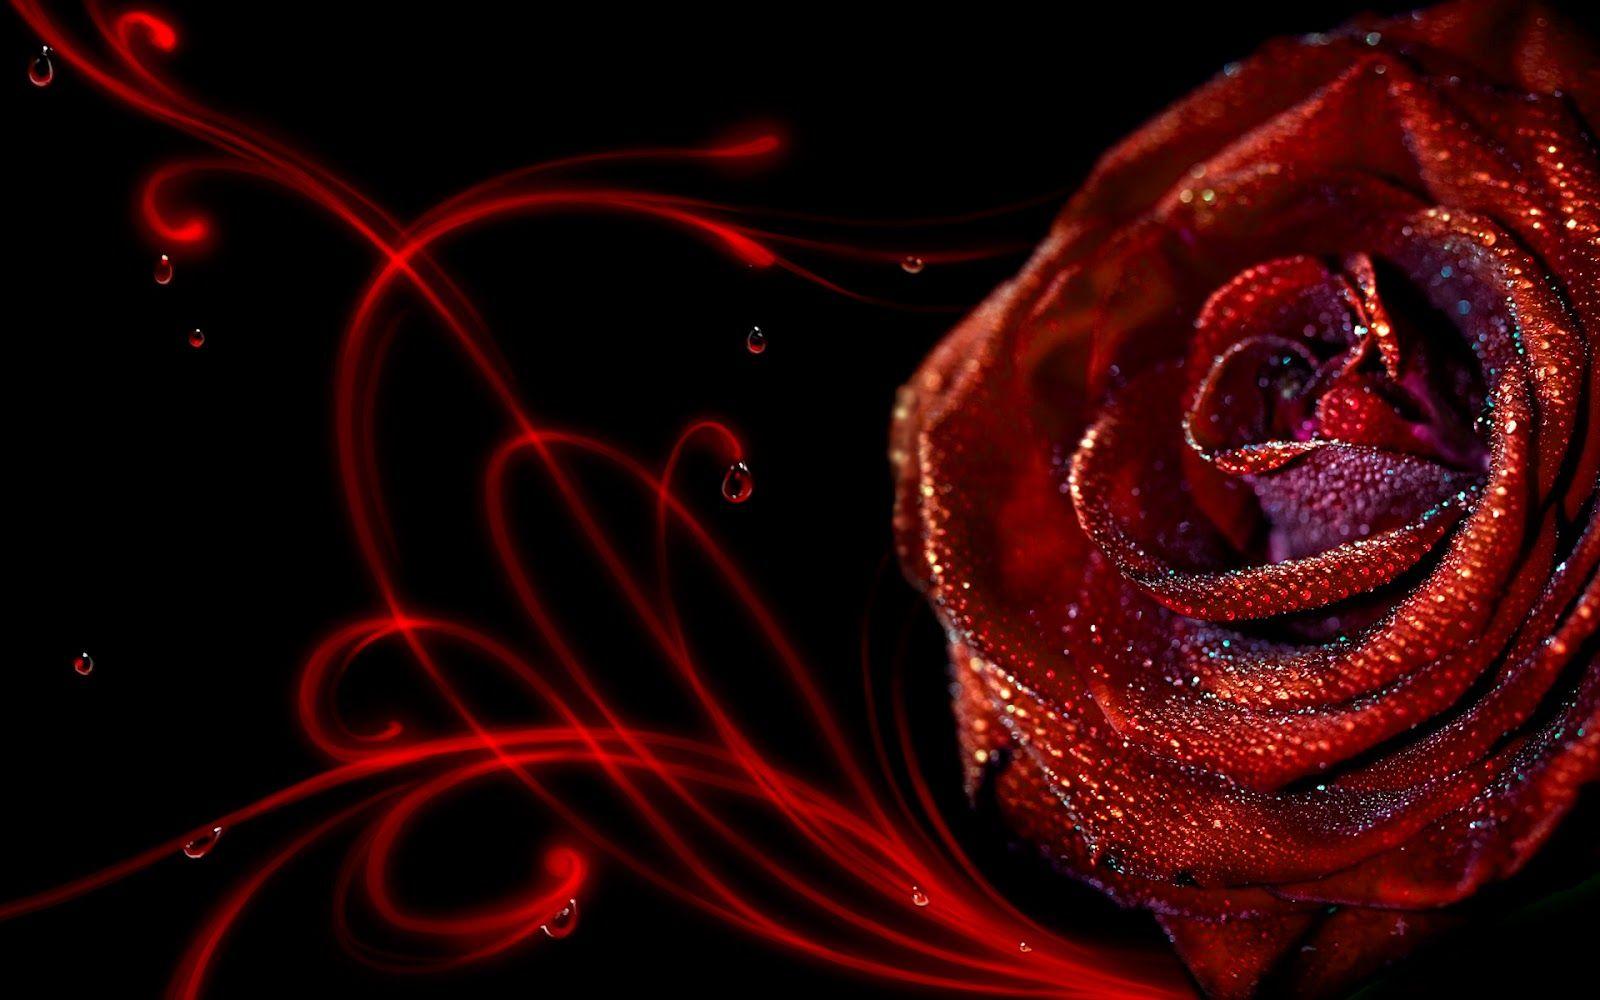 Pin By Mahmoud Ghozlan On Red Roses 3 Rose Wallpaper Rose Images Flower Wallpaper